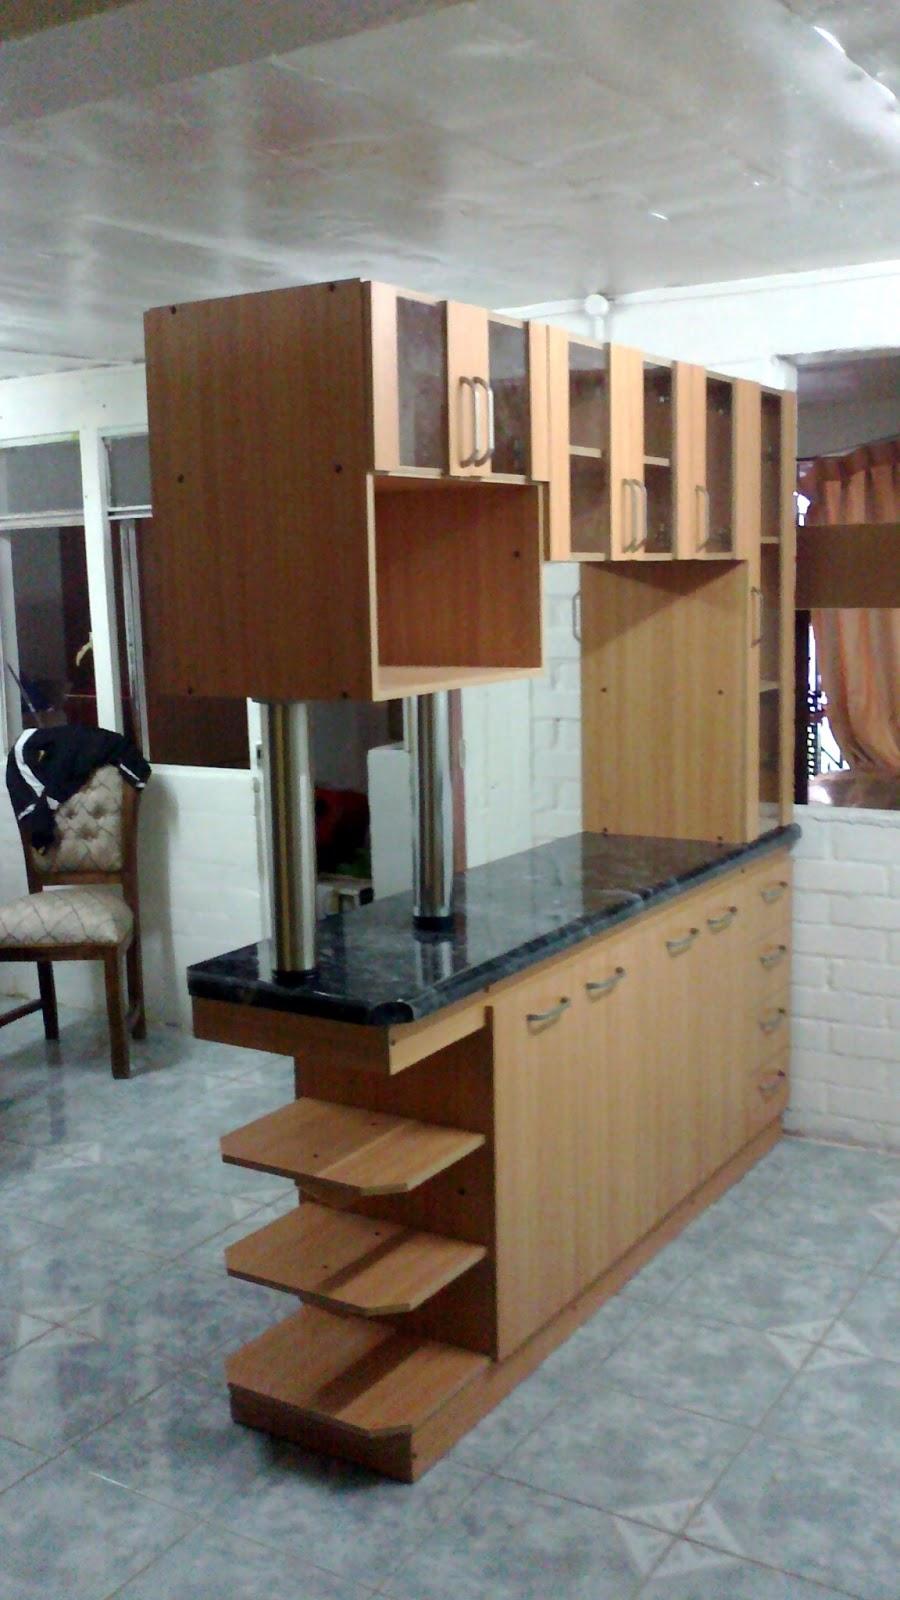 Silva e hijos mueble cocina americana for Mueble persiana cocina